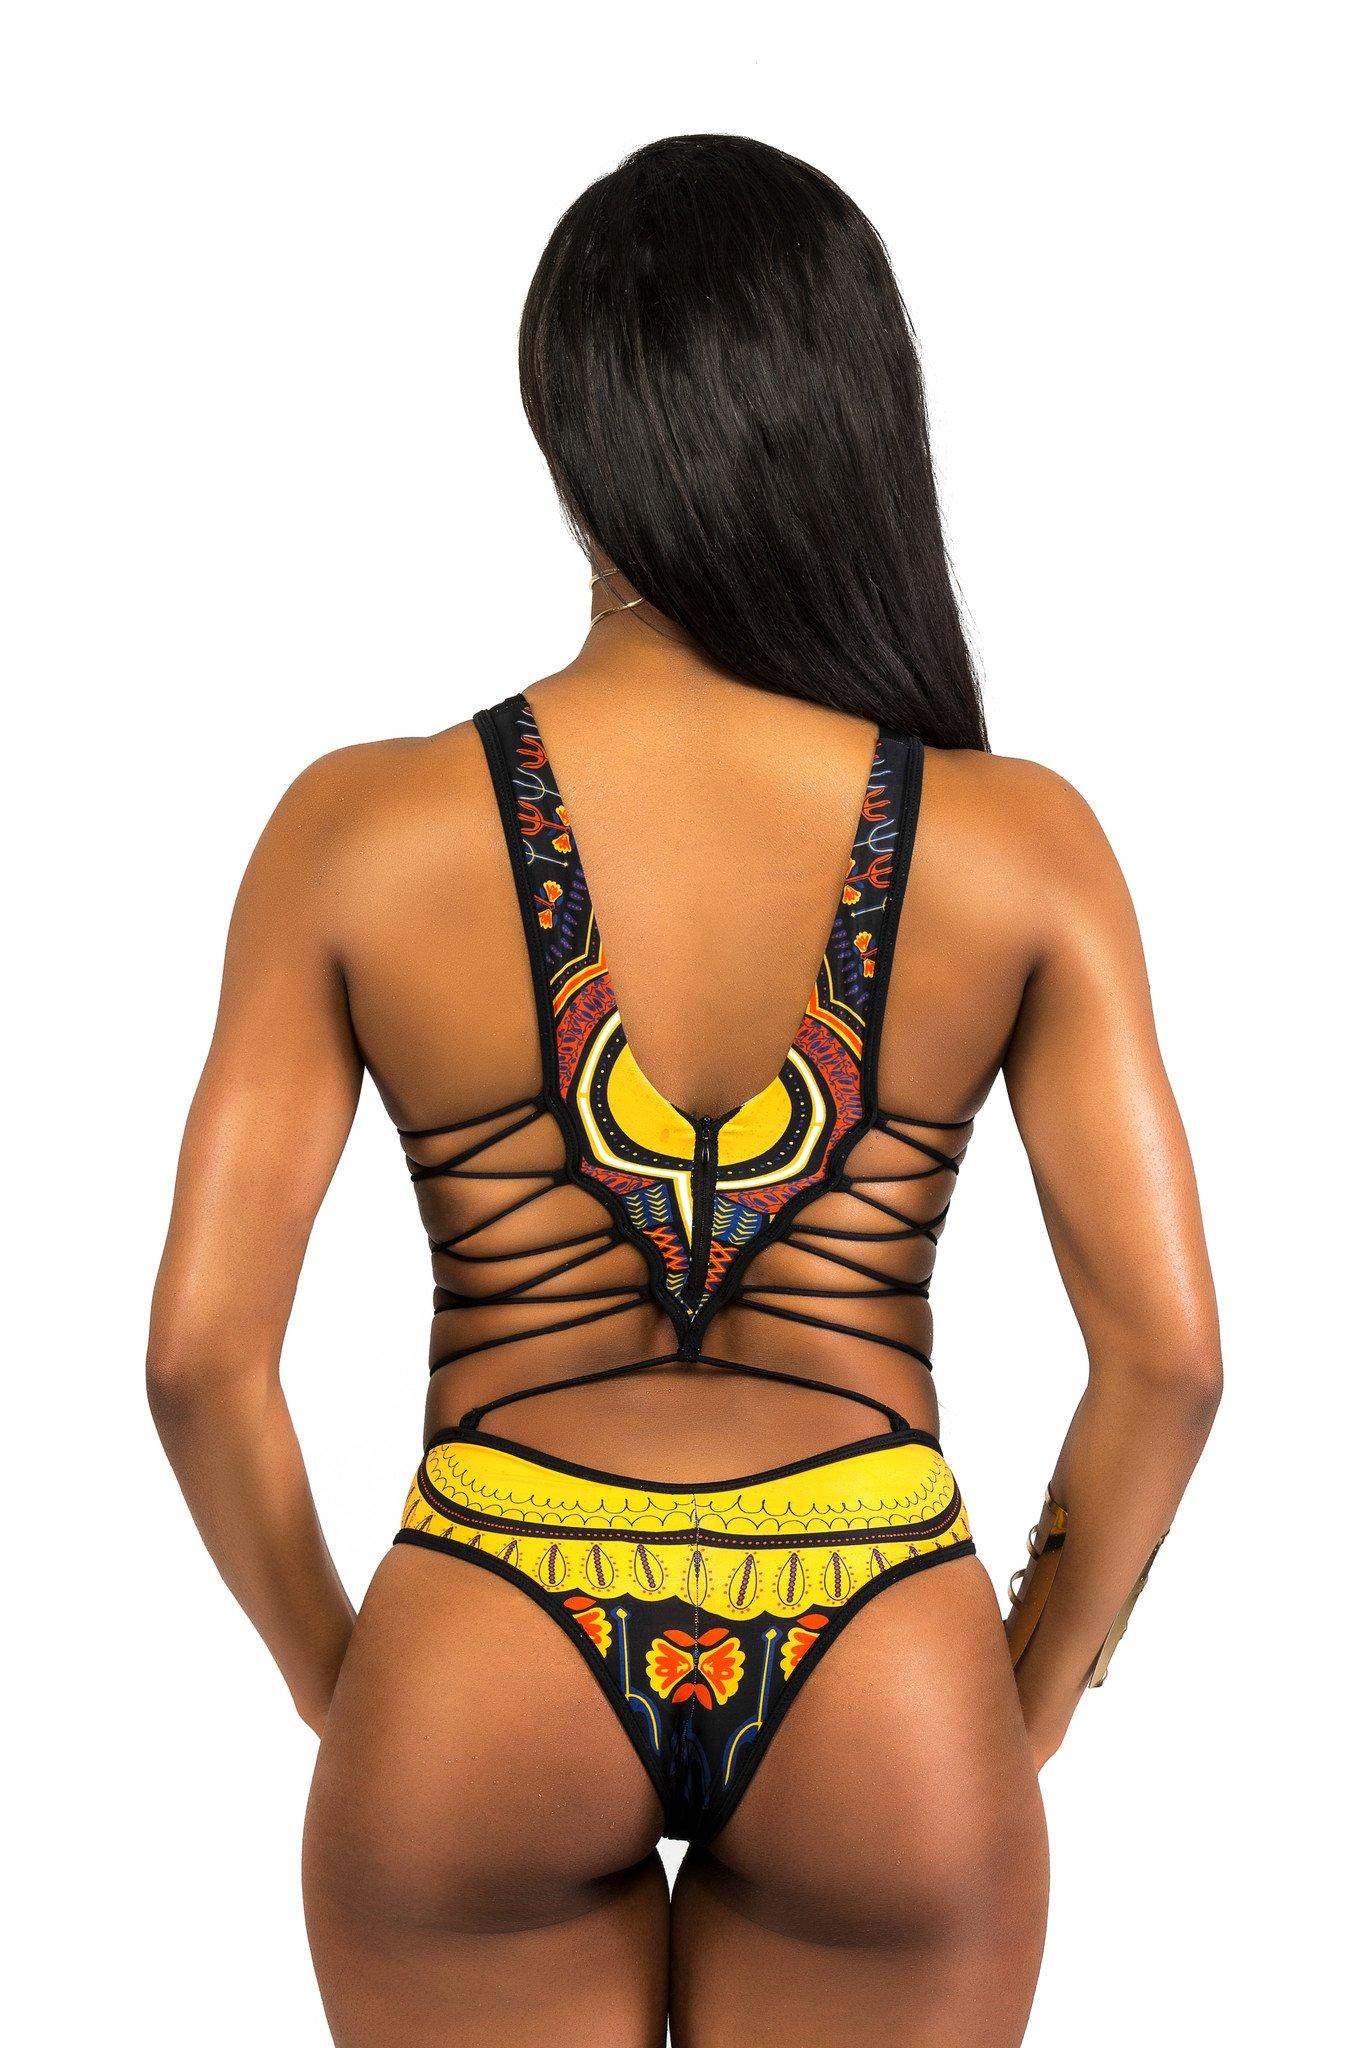 Sexy Bikini African Beauty Clubwear Swimsuit One Piece